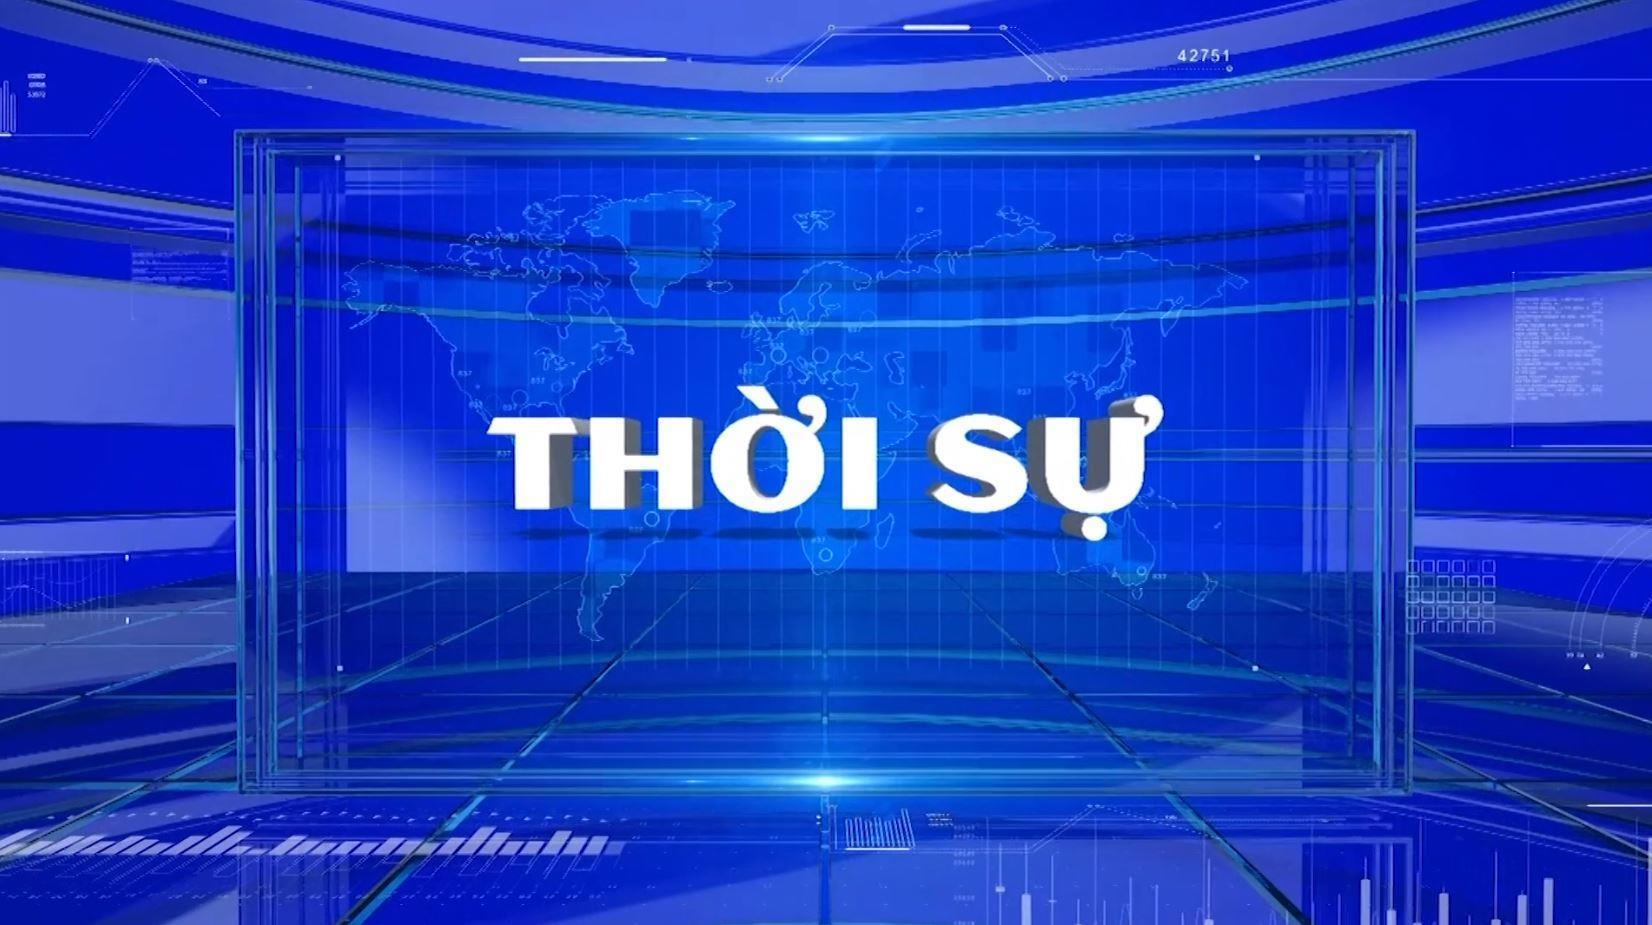 Thời sự 11H30 T6 (18-10-2019)